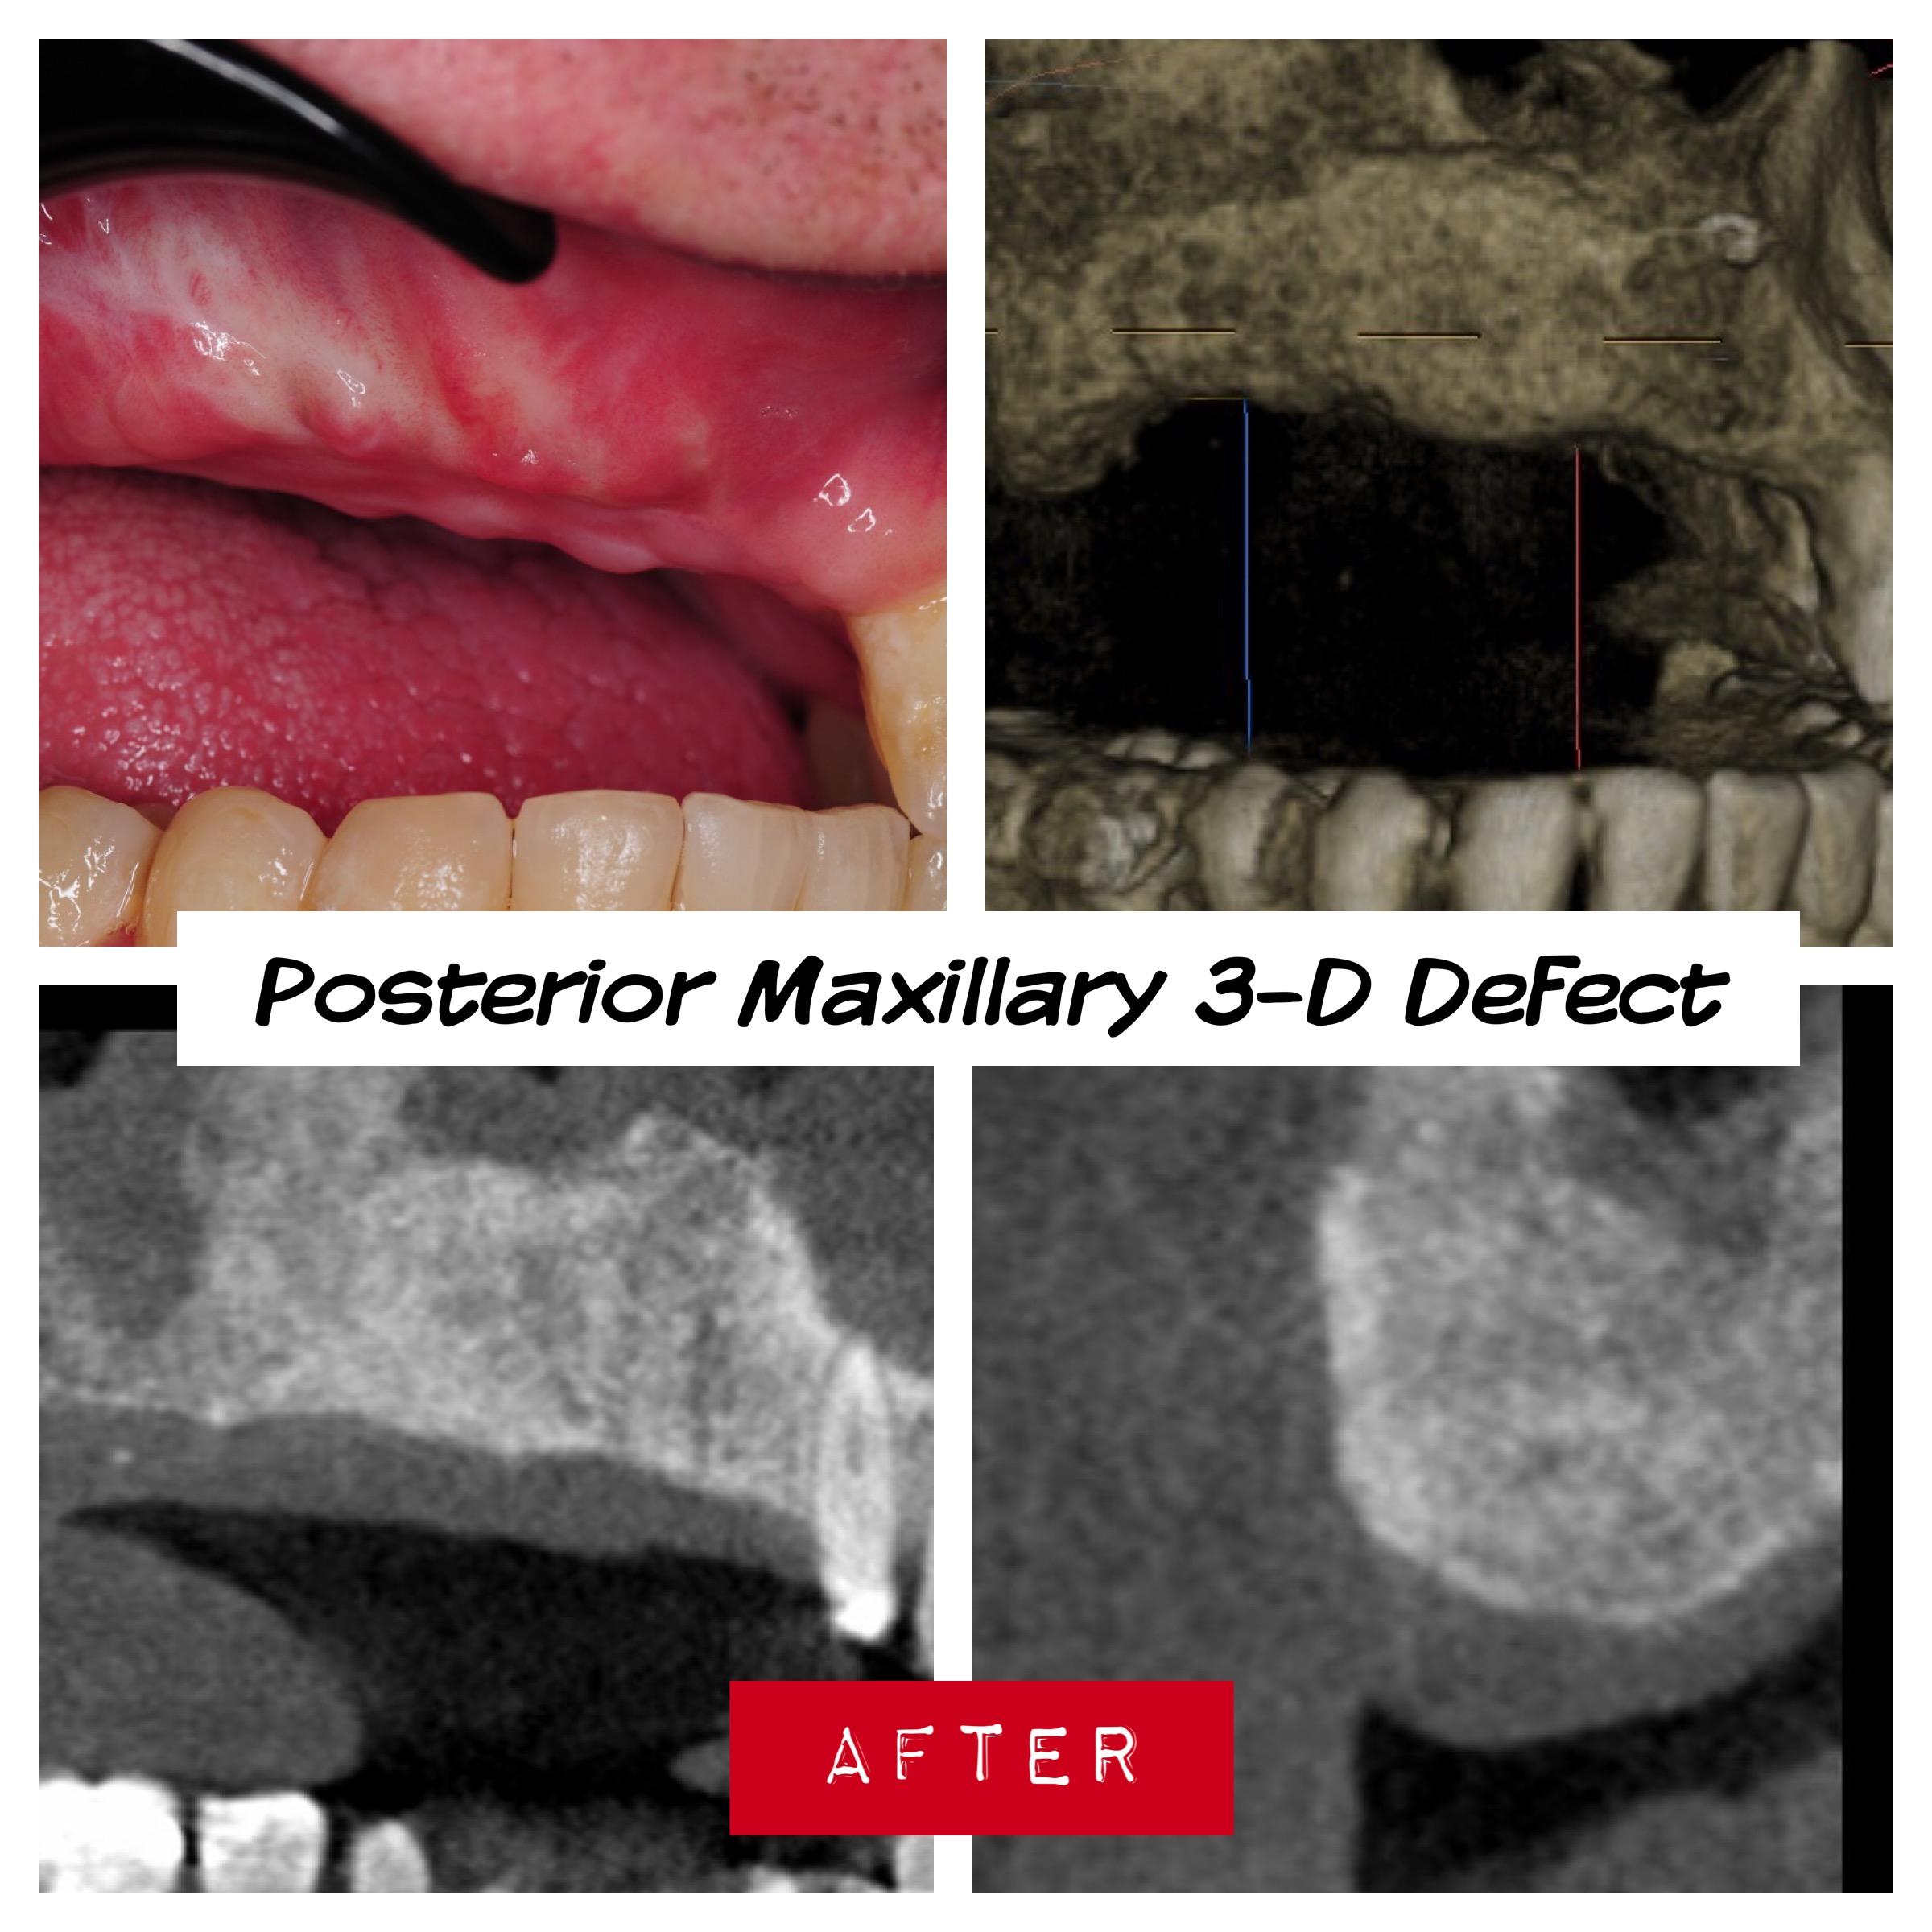 2.-posterior-maxilla-defect-after-osteogenesis-distraction-guided-bone-regenerationkazemi-oral-surgery-dental-implants